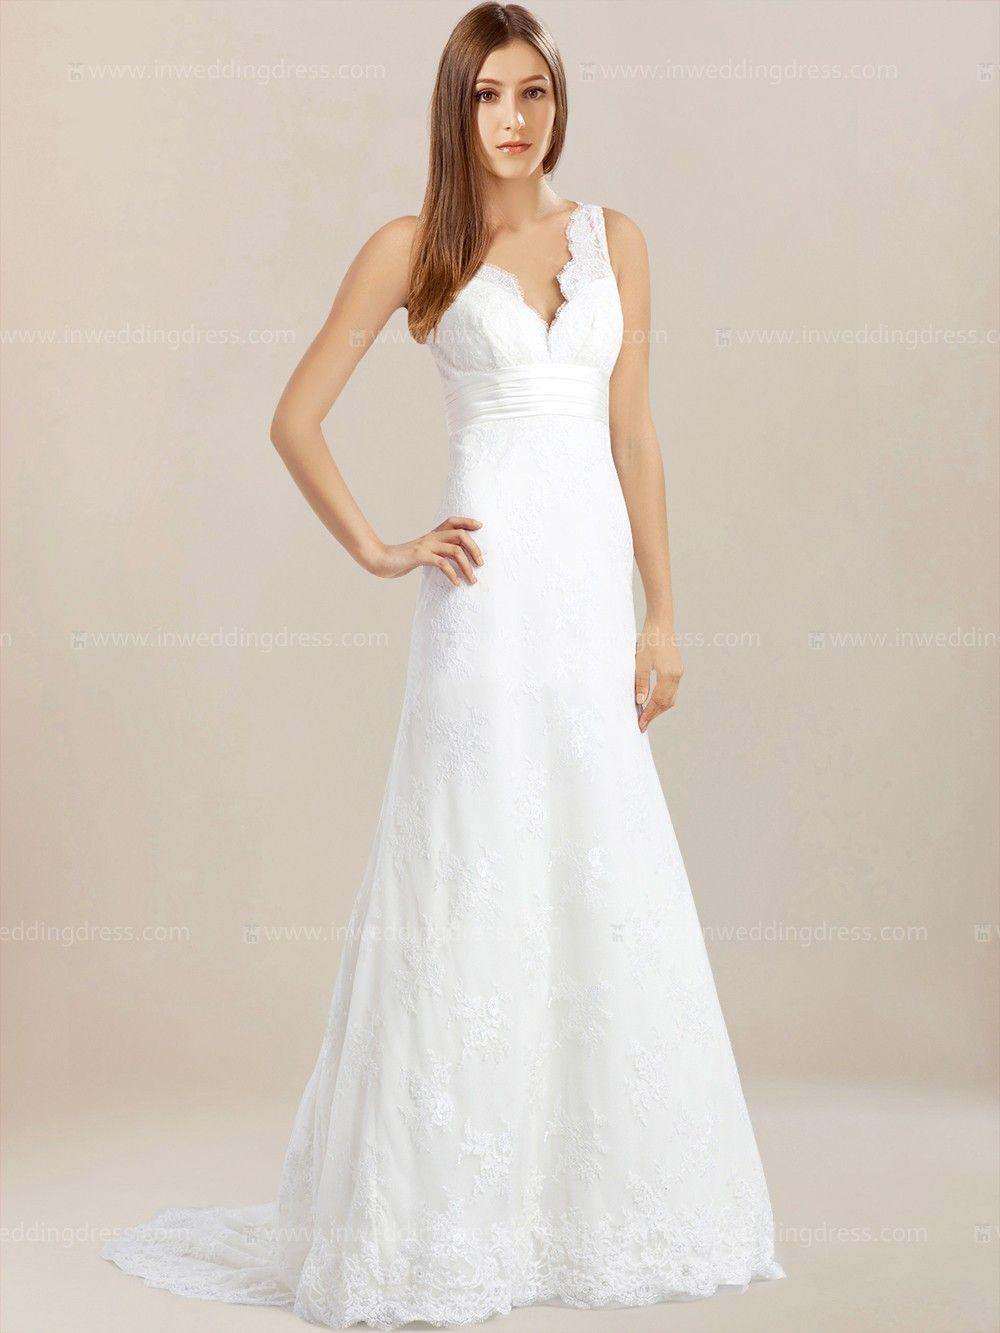 Lace V Neck Wedding Dress With Pleated Sash BC332